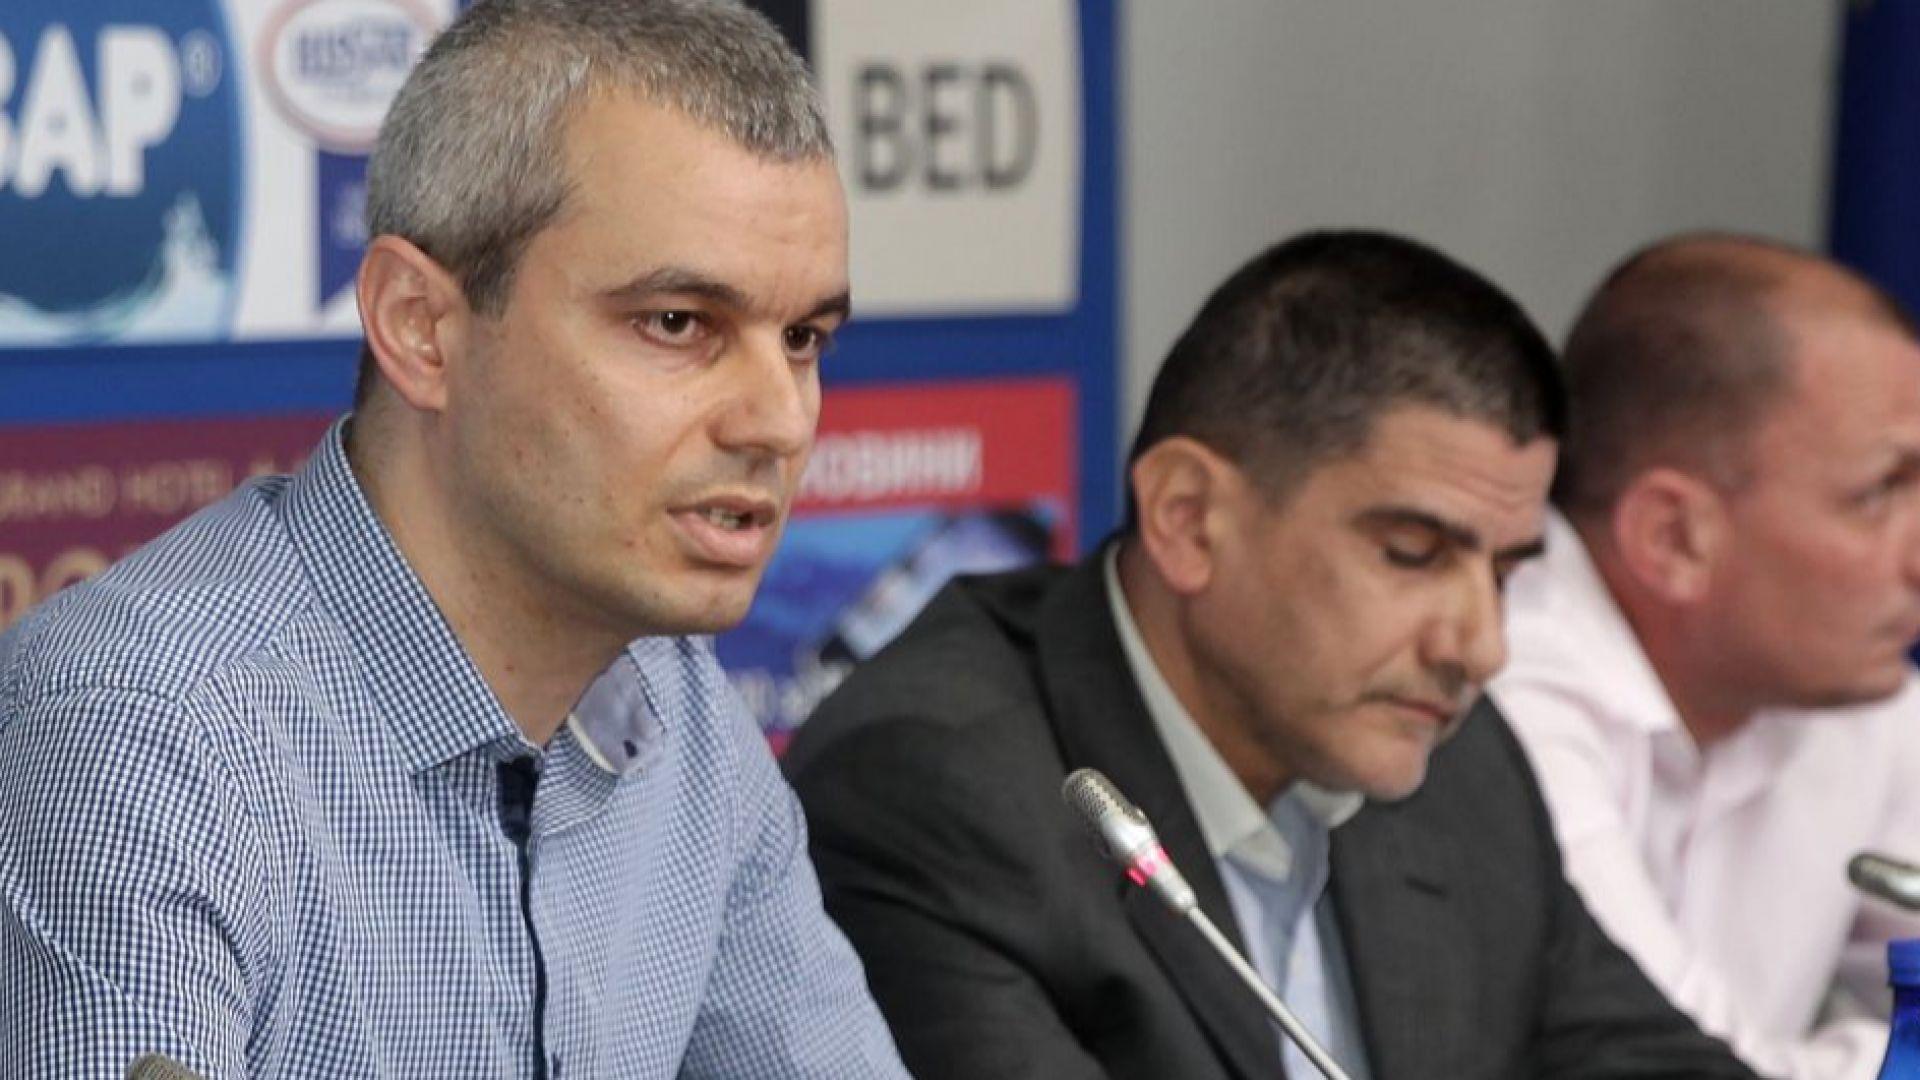 "През 2017 година Костадин Костадинов заведе дело срещу лидера на ""Воля"" Веселин Марешки, който му ударил шамар"